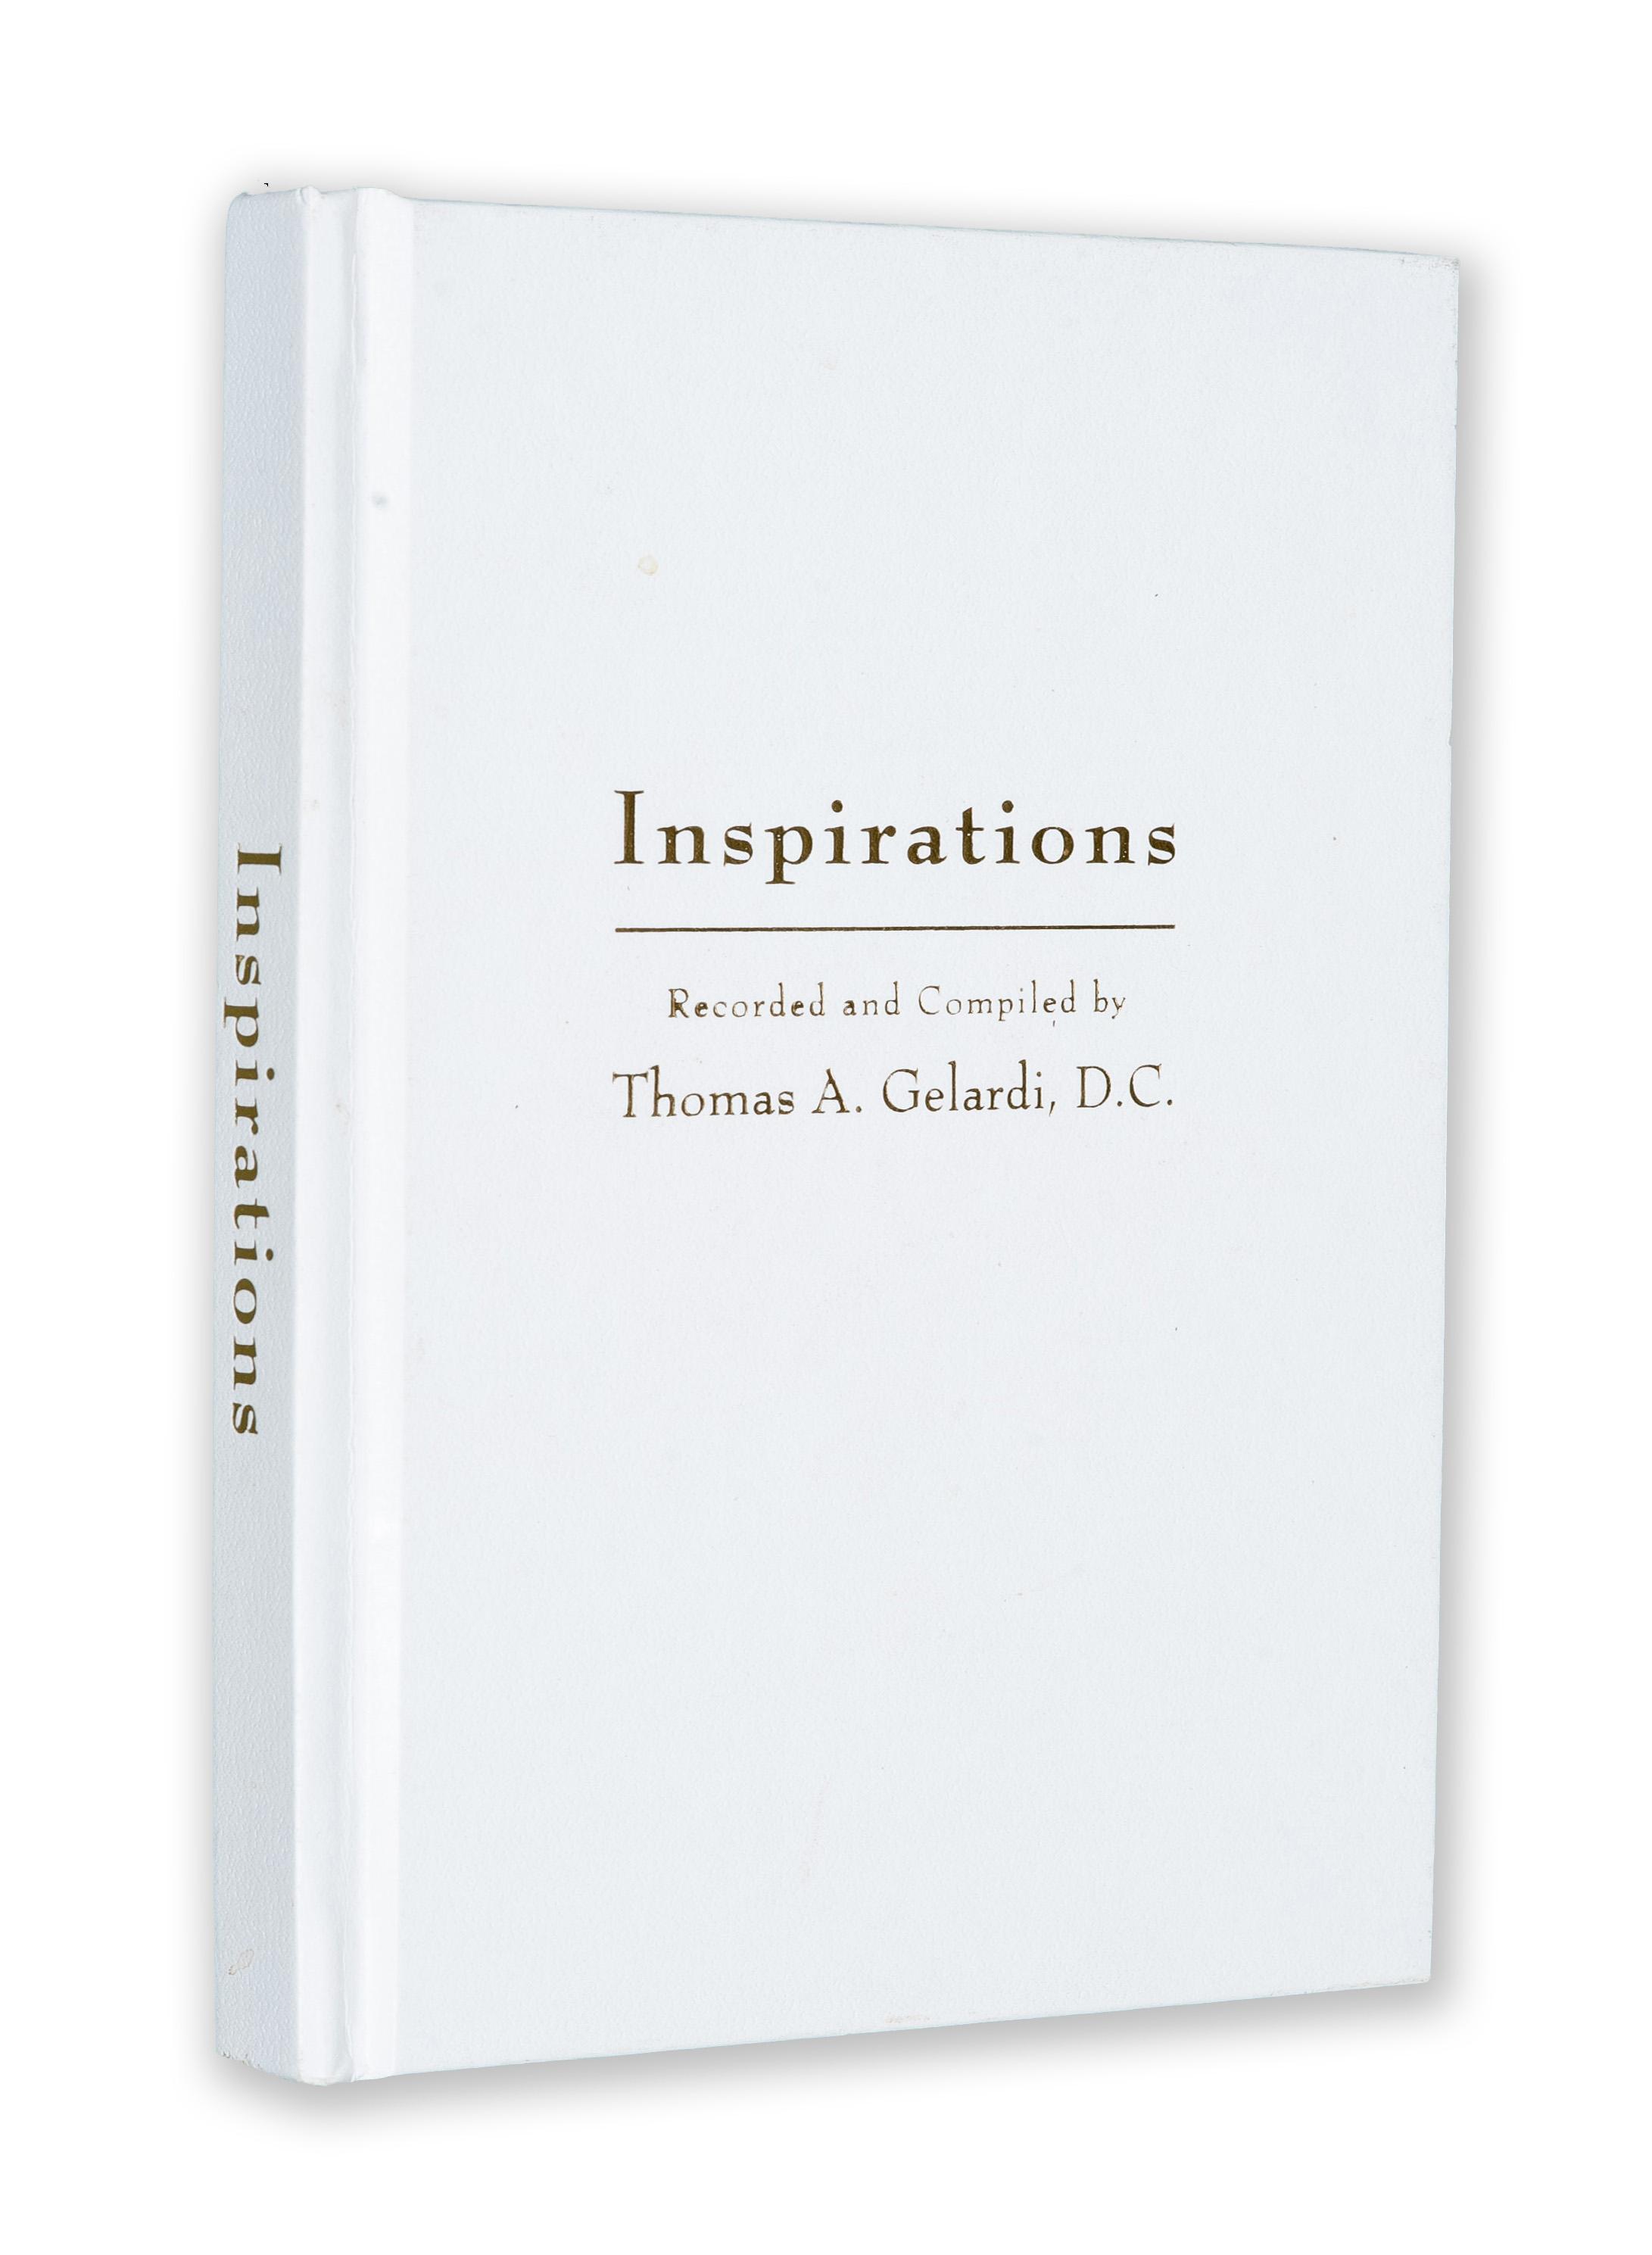 Inspirations (1999)